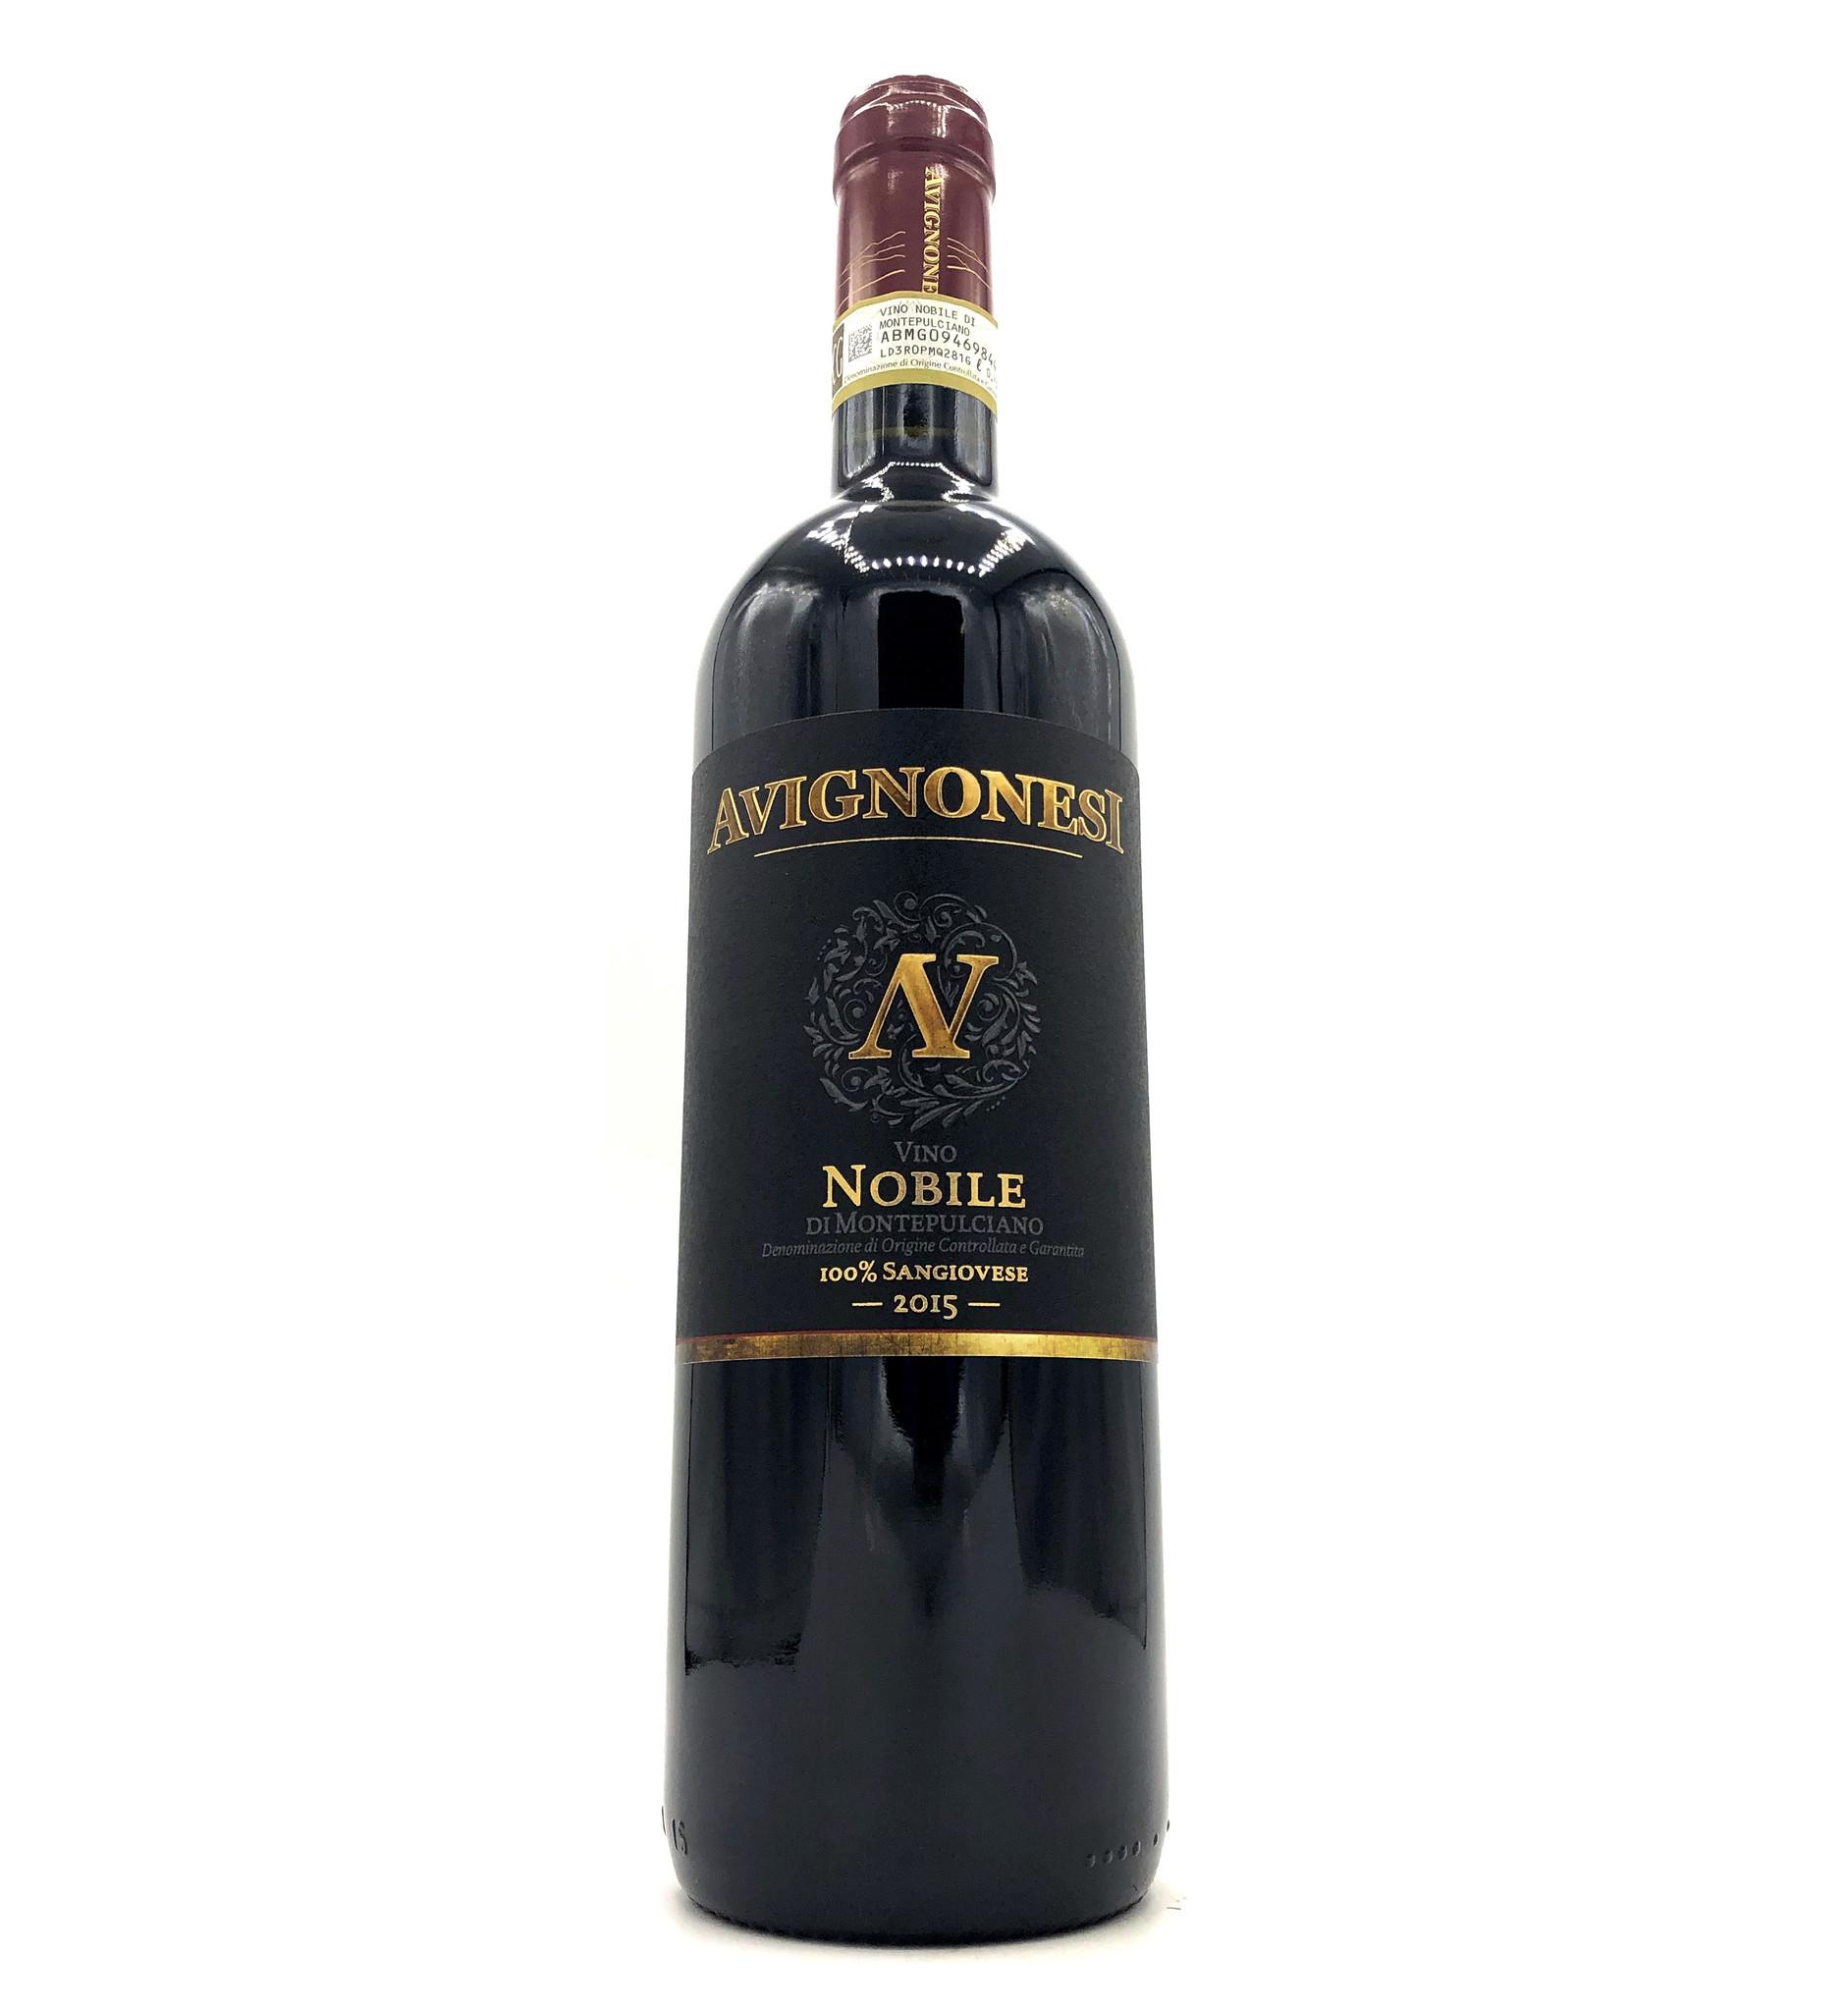 Vino Nobile di Montepulciano 2015 Avignonesi